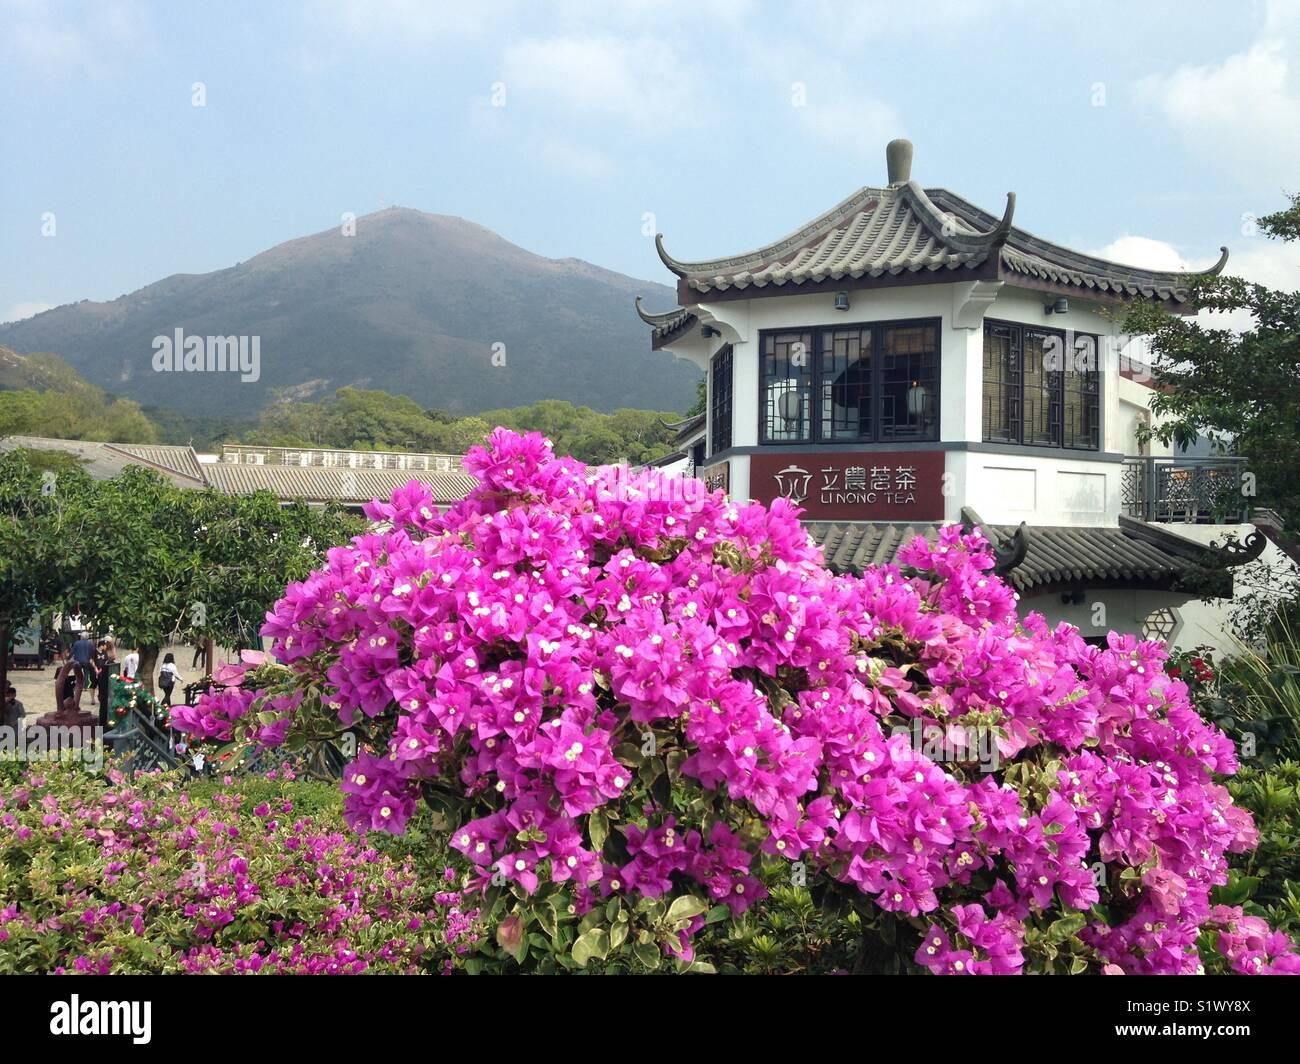 Hong Kong Lantau Island. - Stock Image